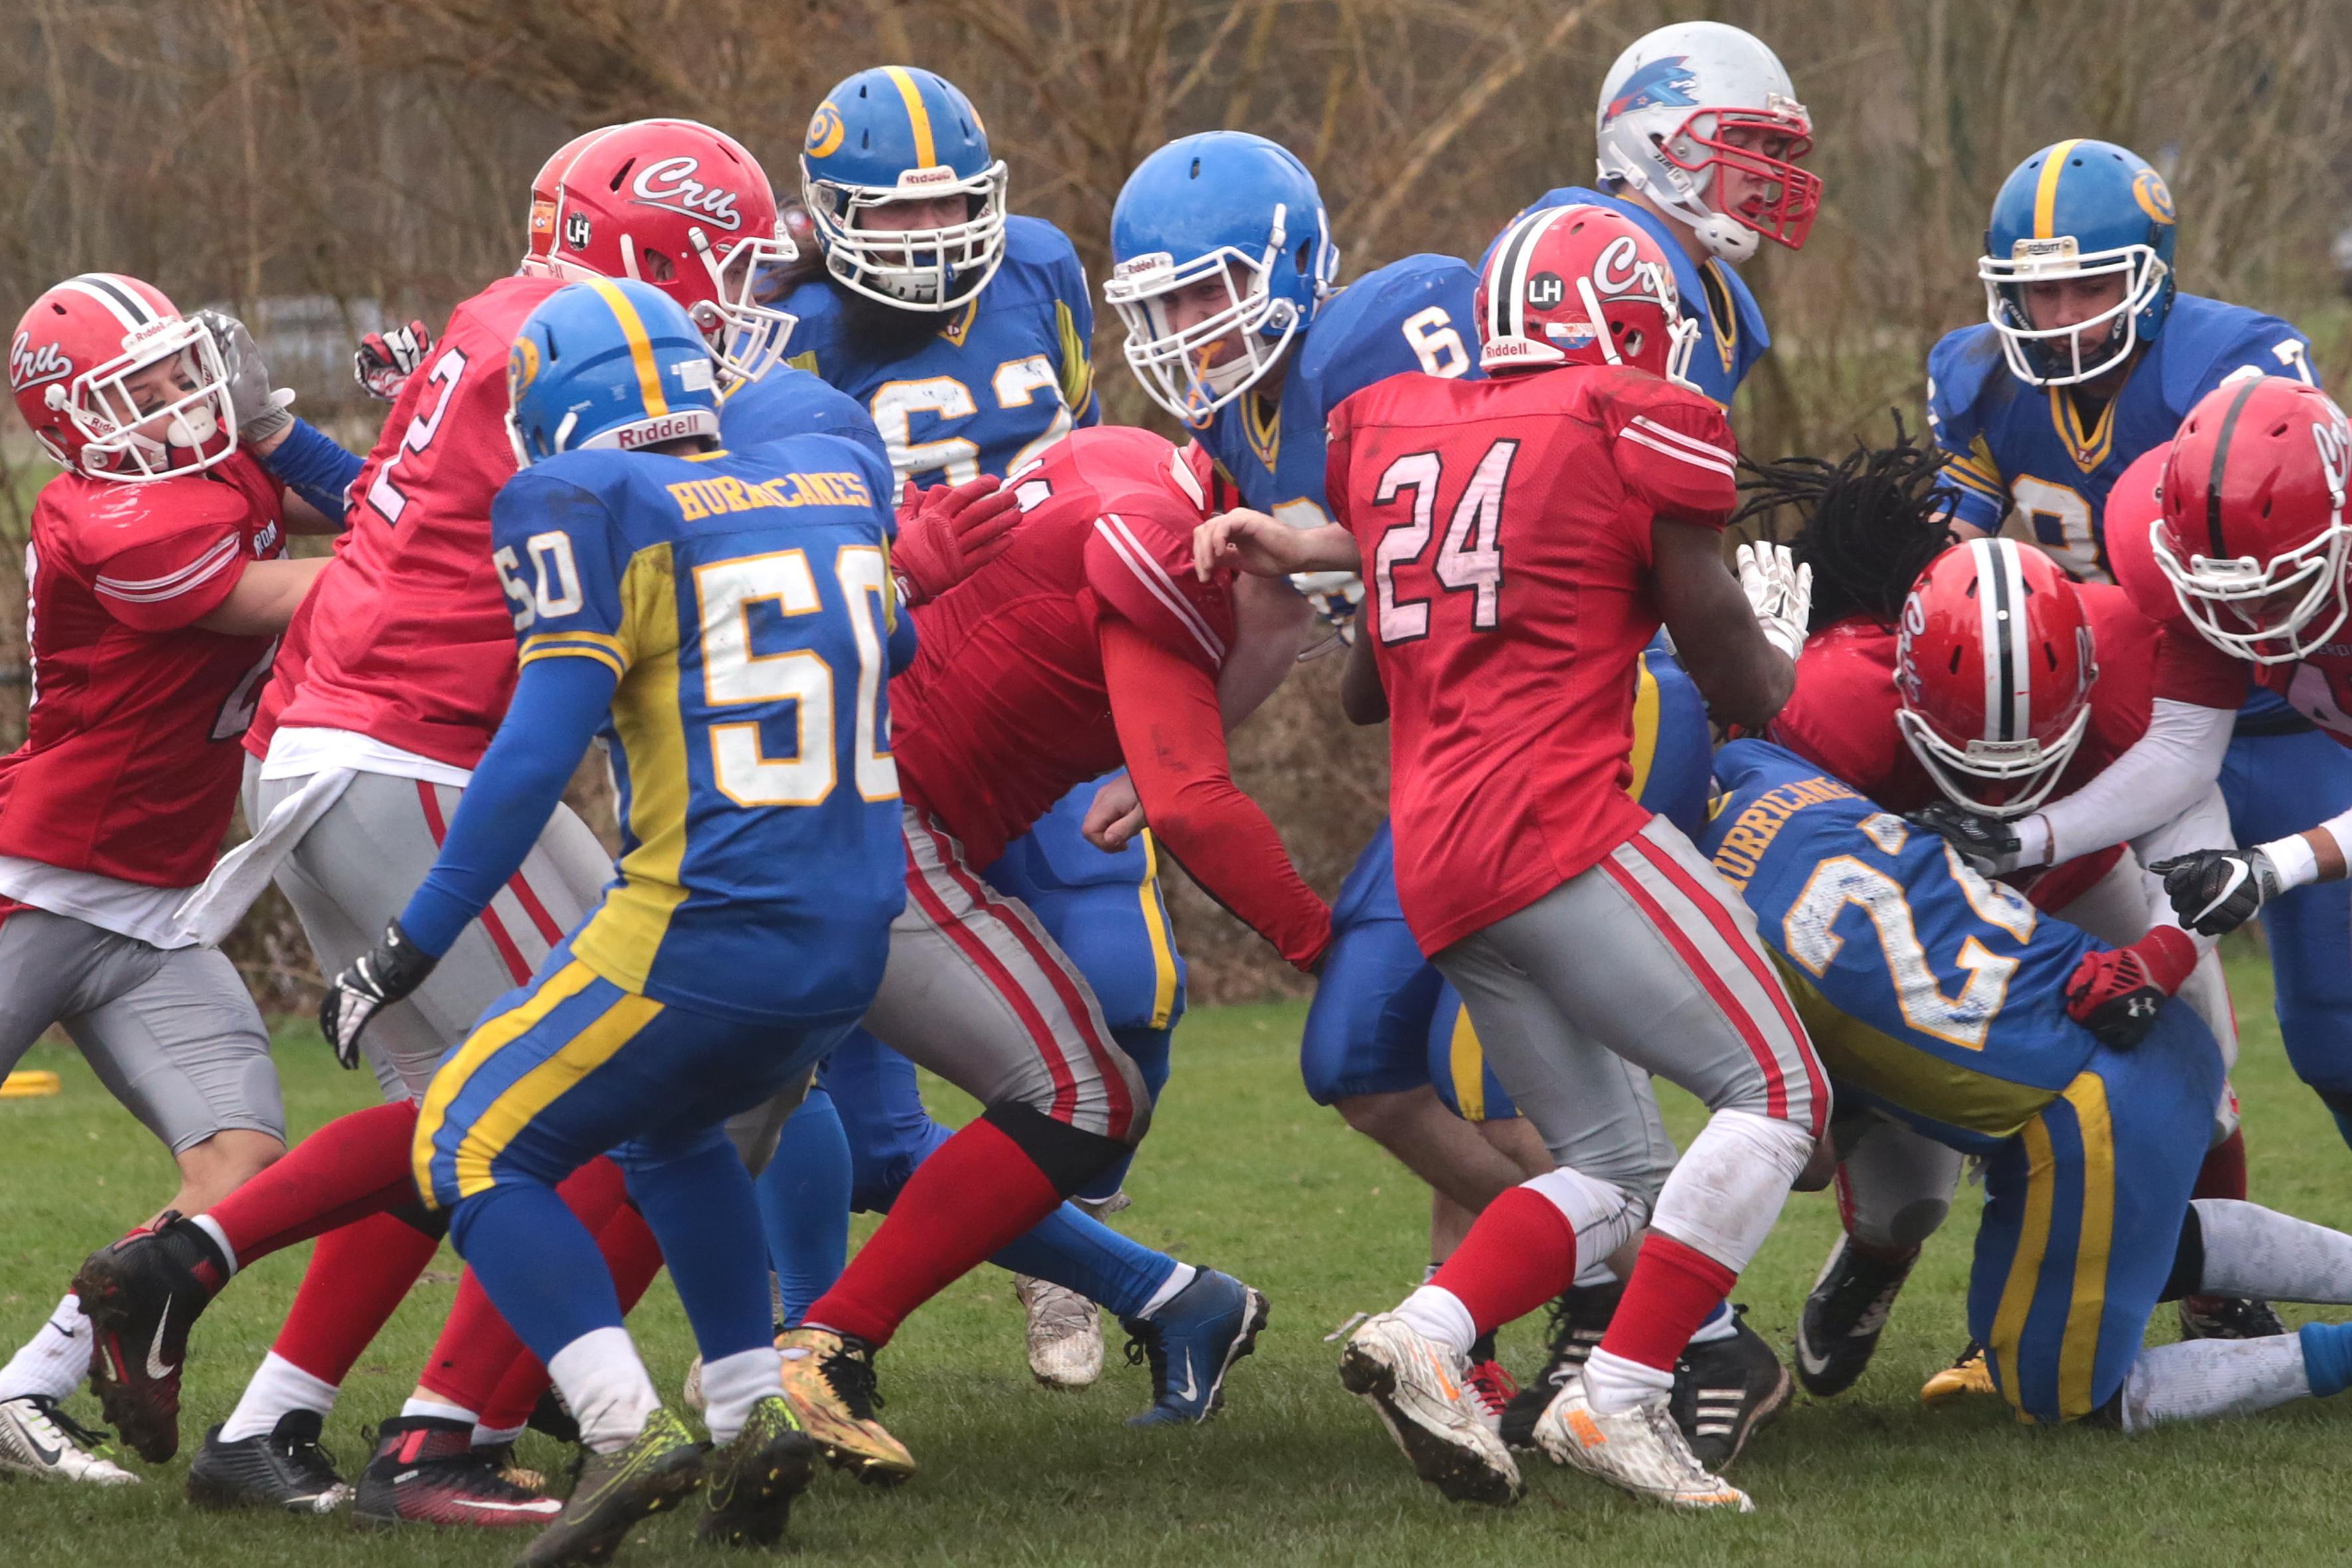 Slechts vijf teams over in eredivisie American football